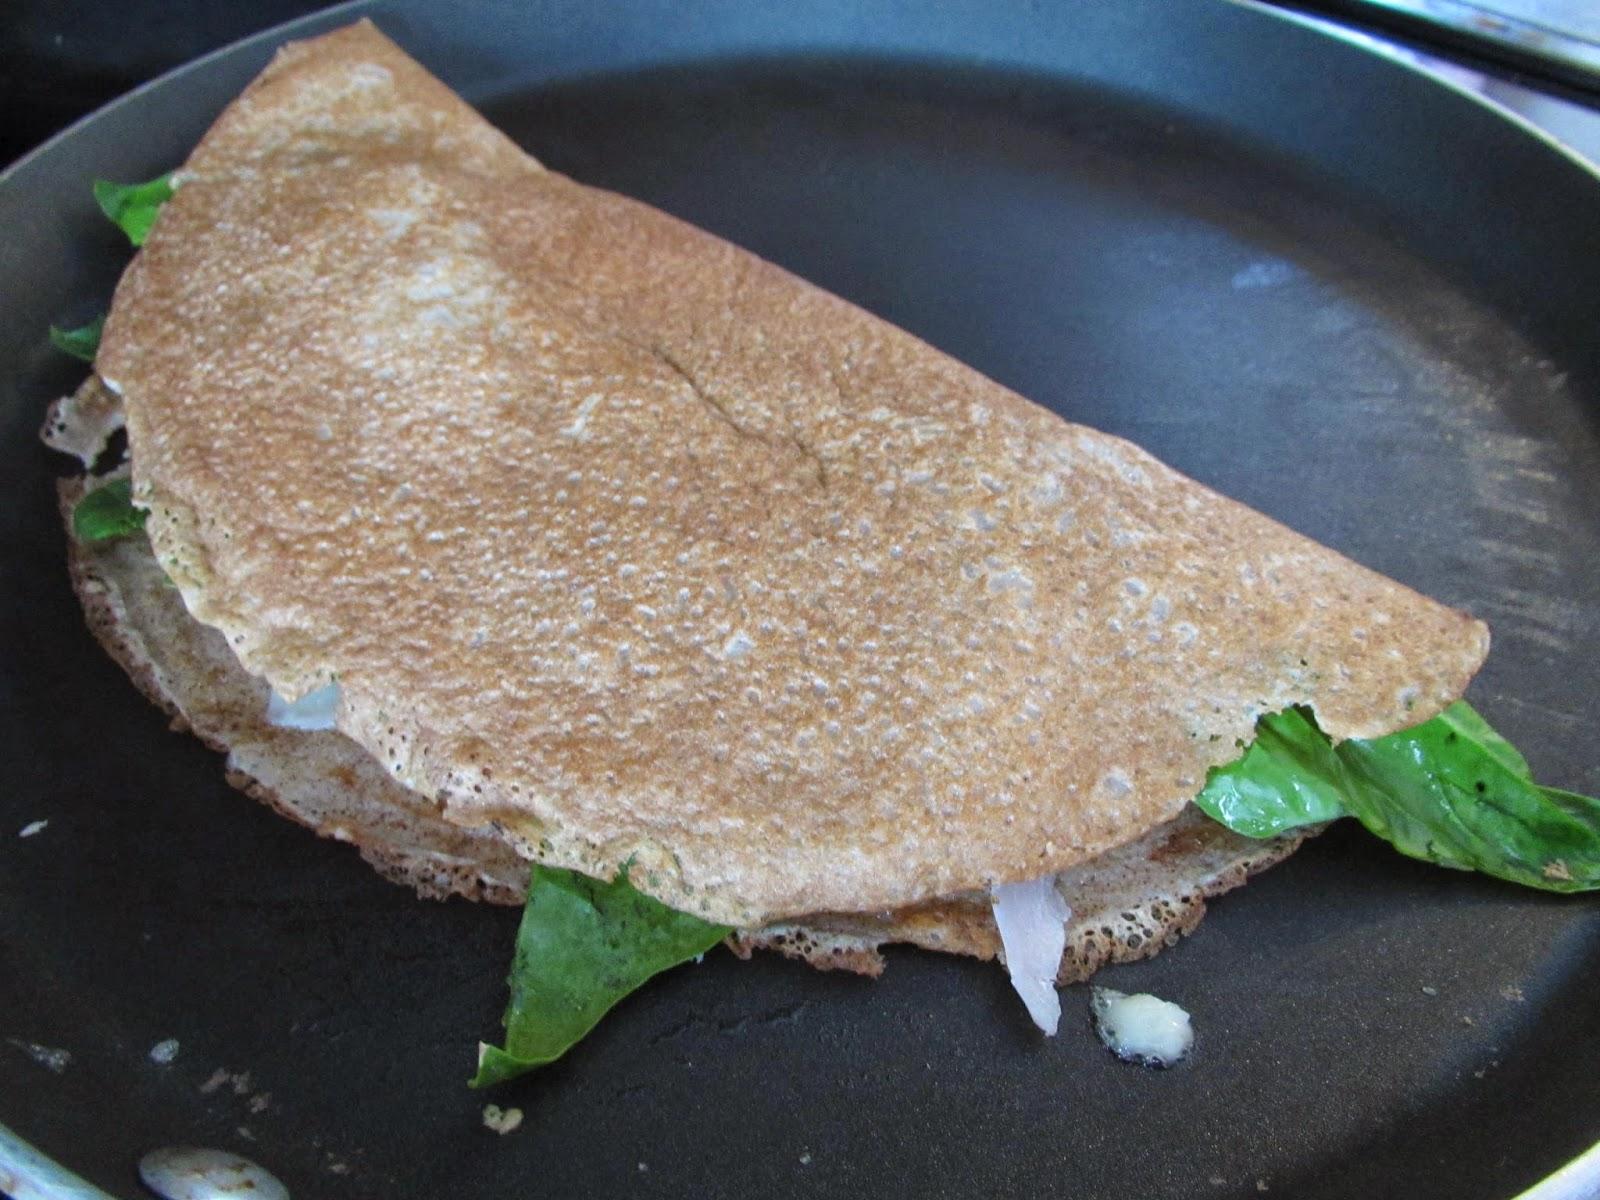 Cooking a Gluten Free Hot Crepe Sandwich